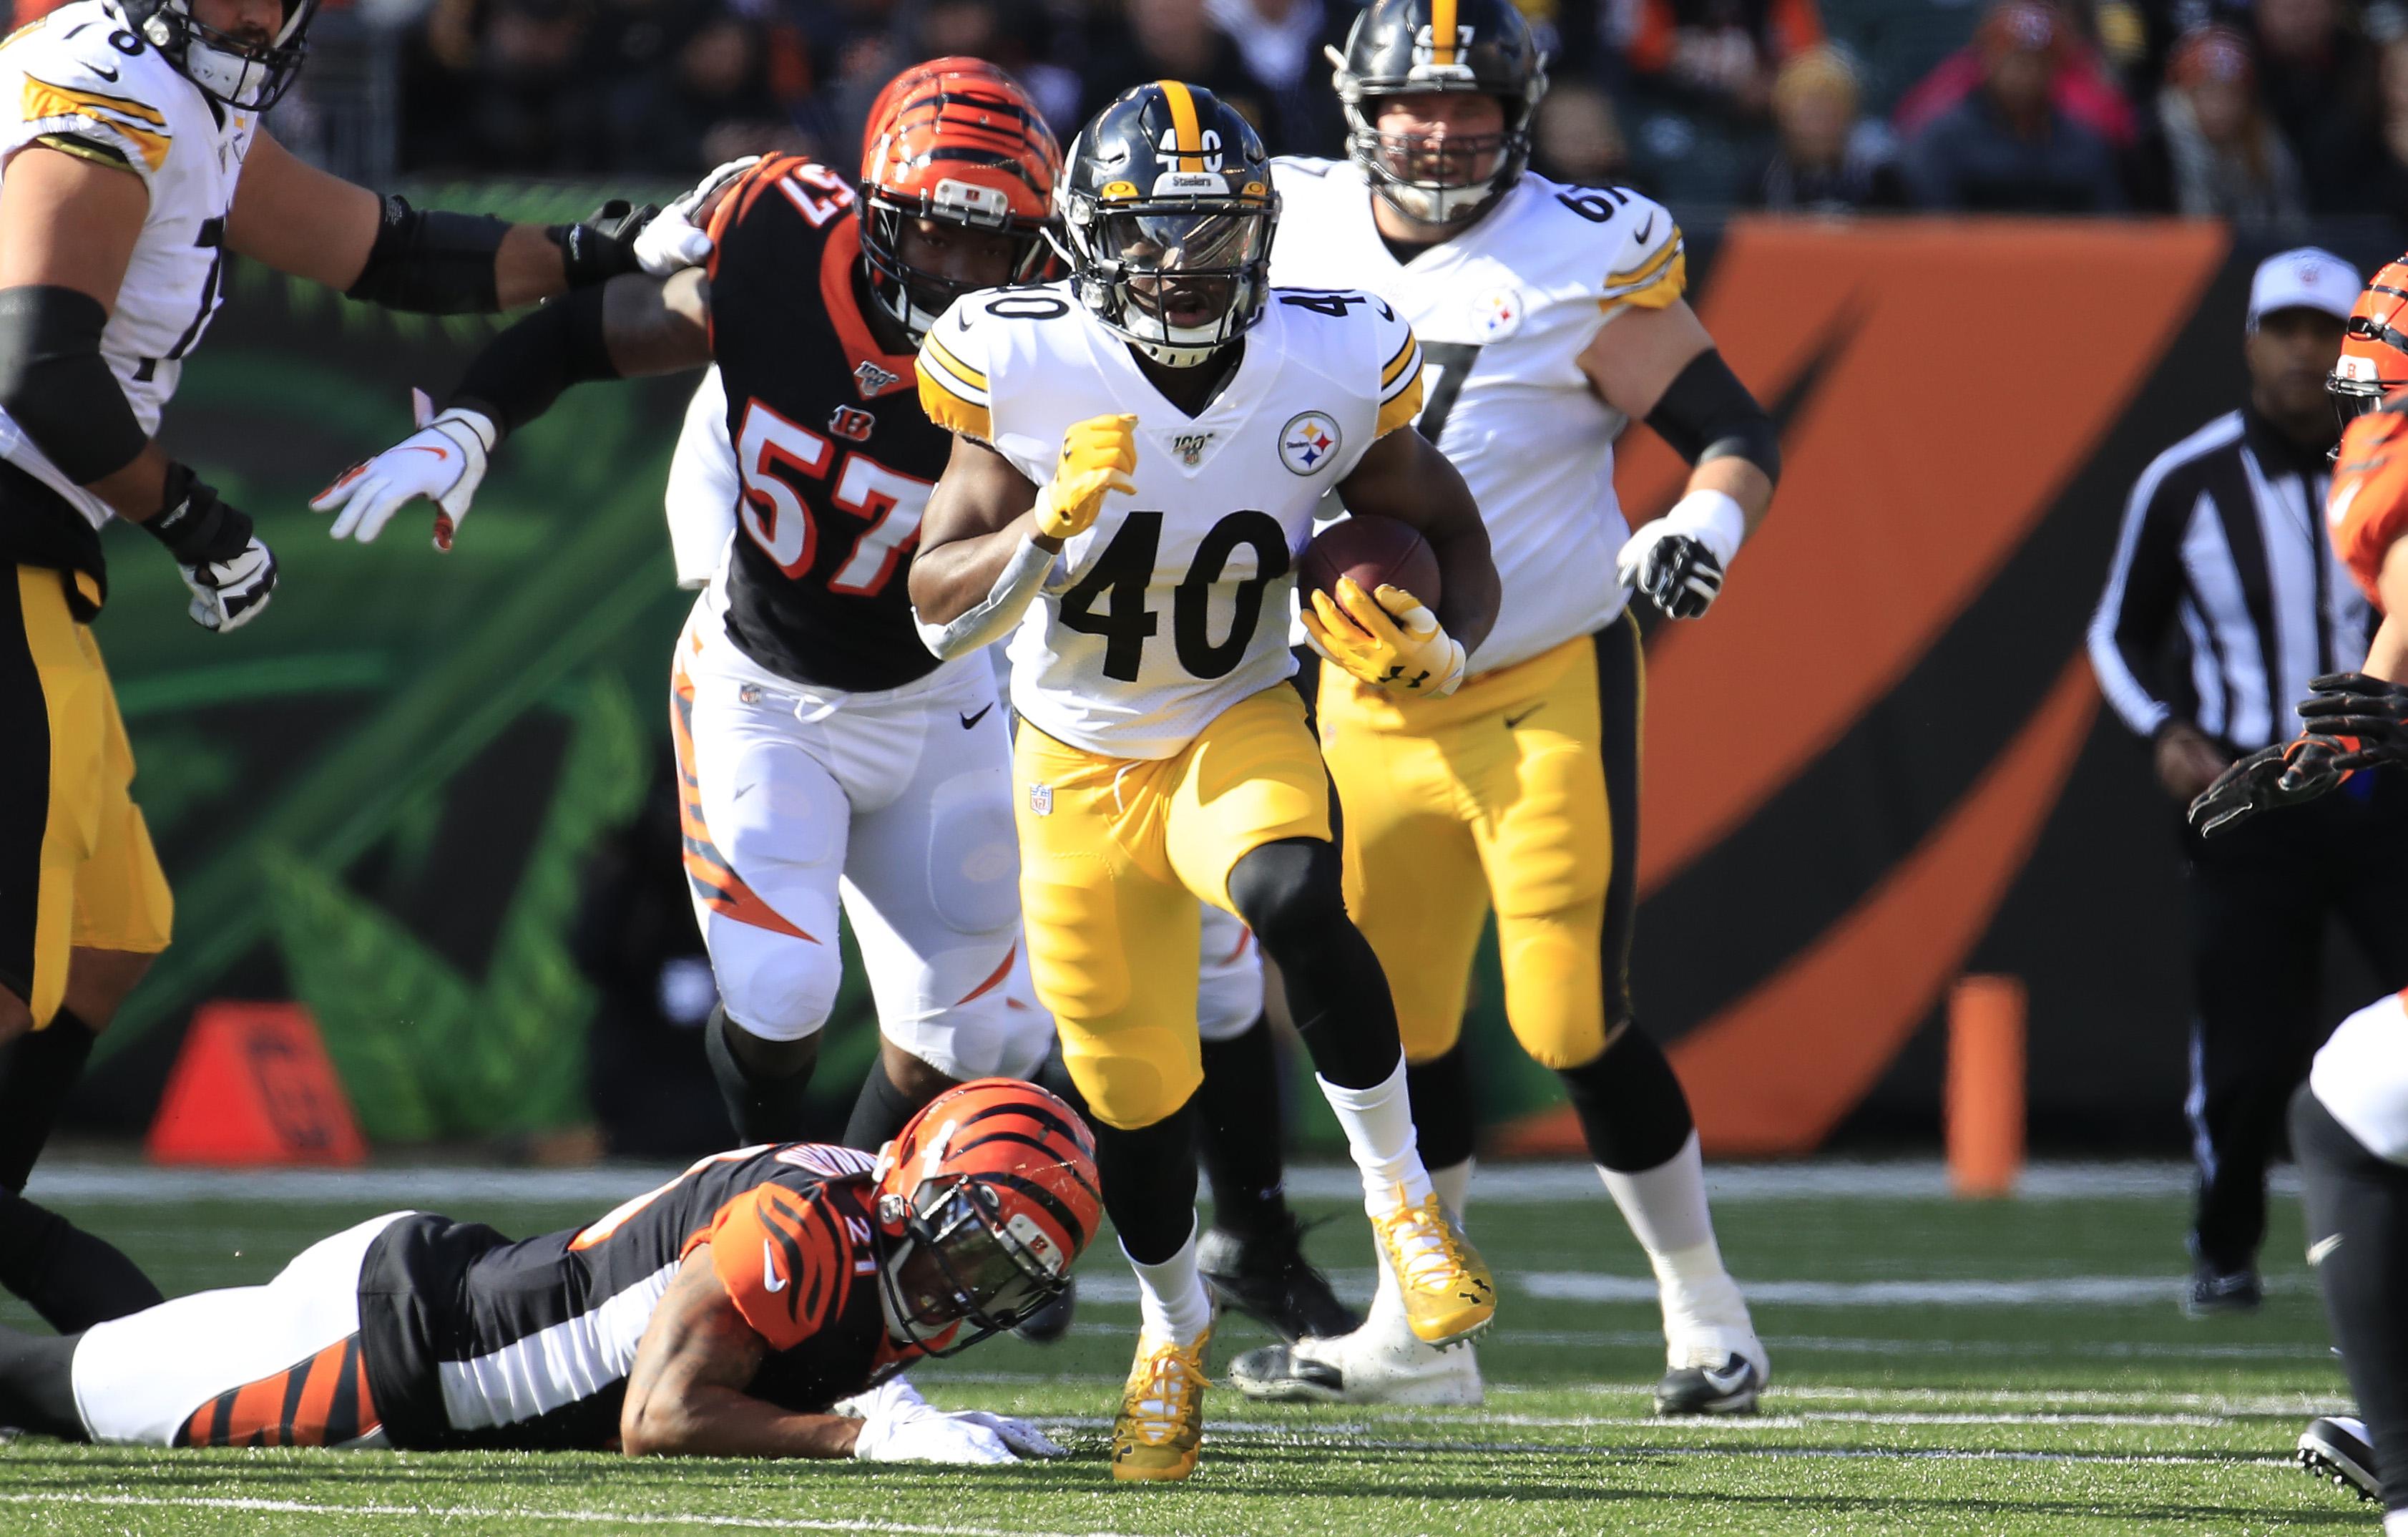 Pittsburgh Steelers vCincinnati Bengals